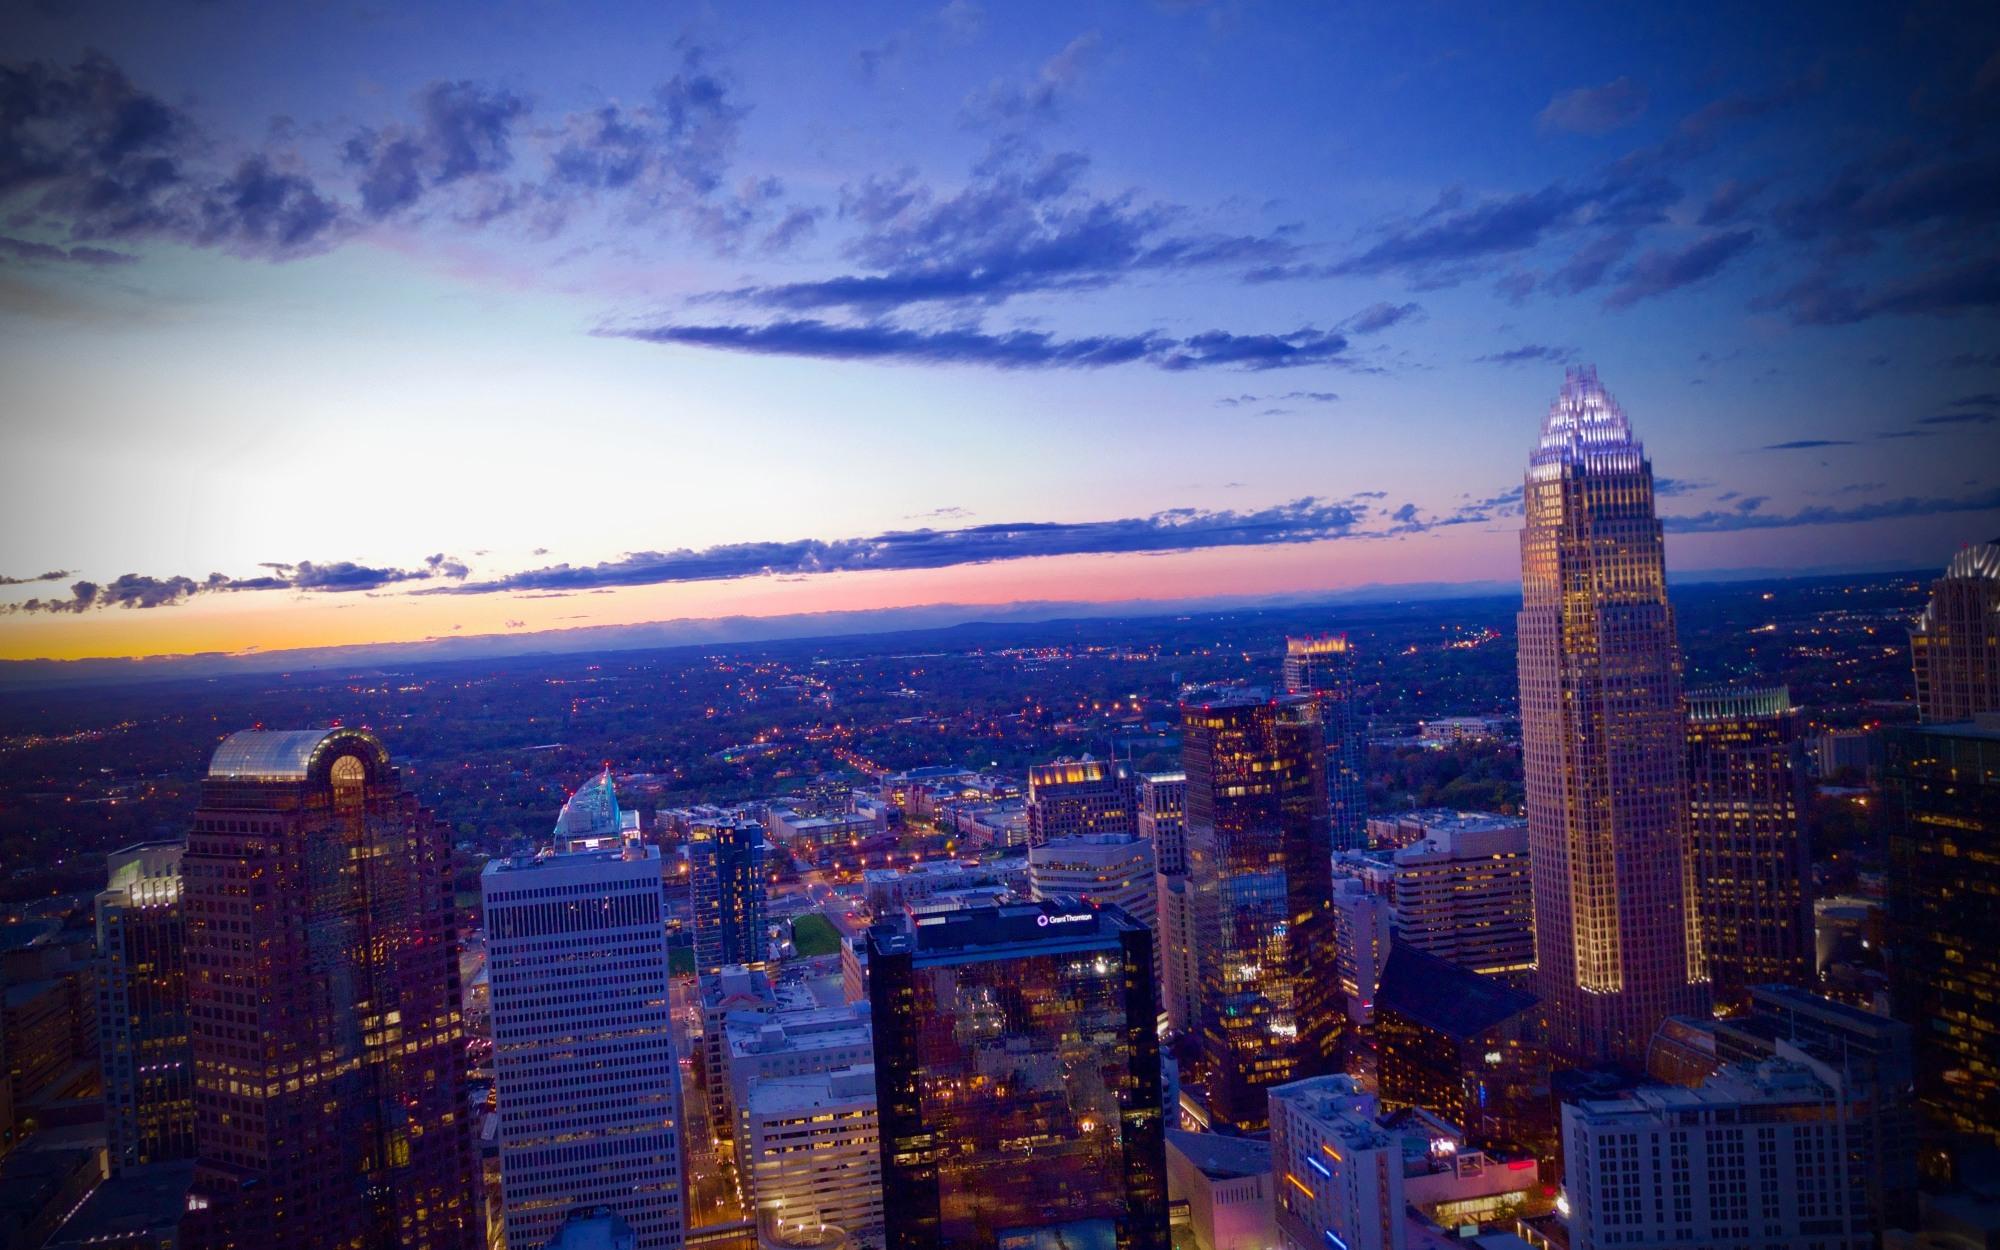 Charlotte, North Carolina Info@OpulenceImages.com